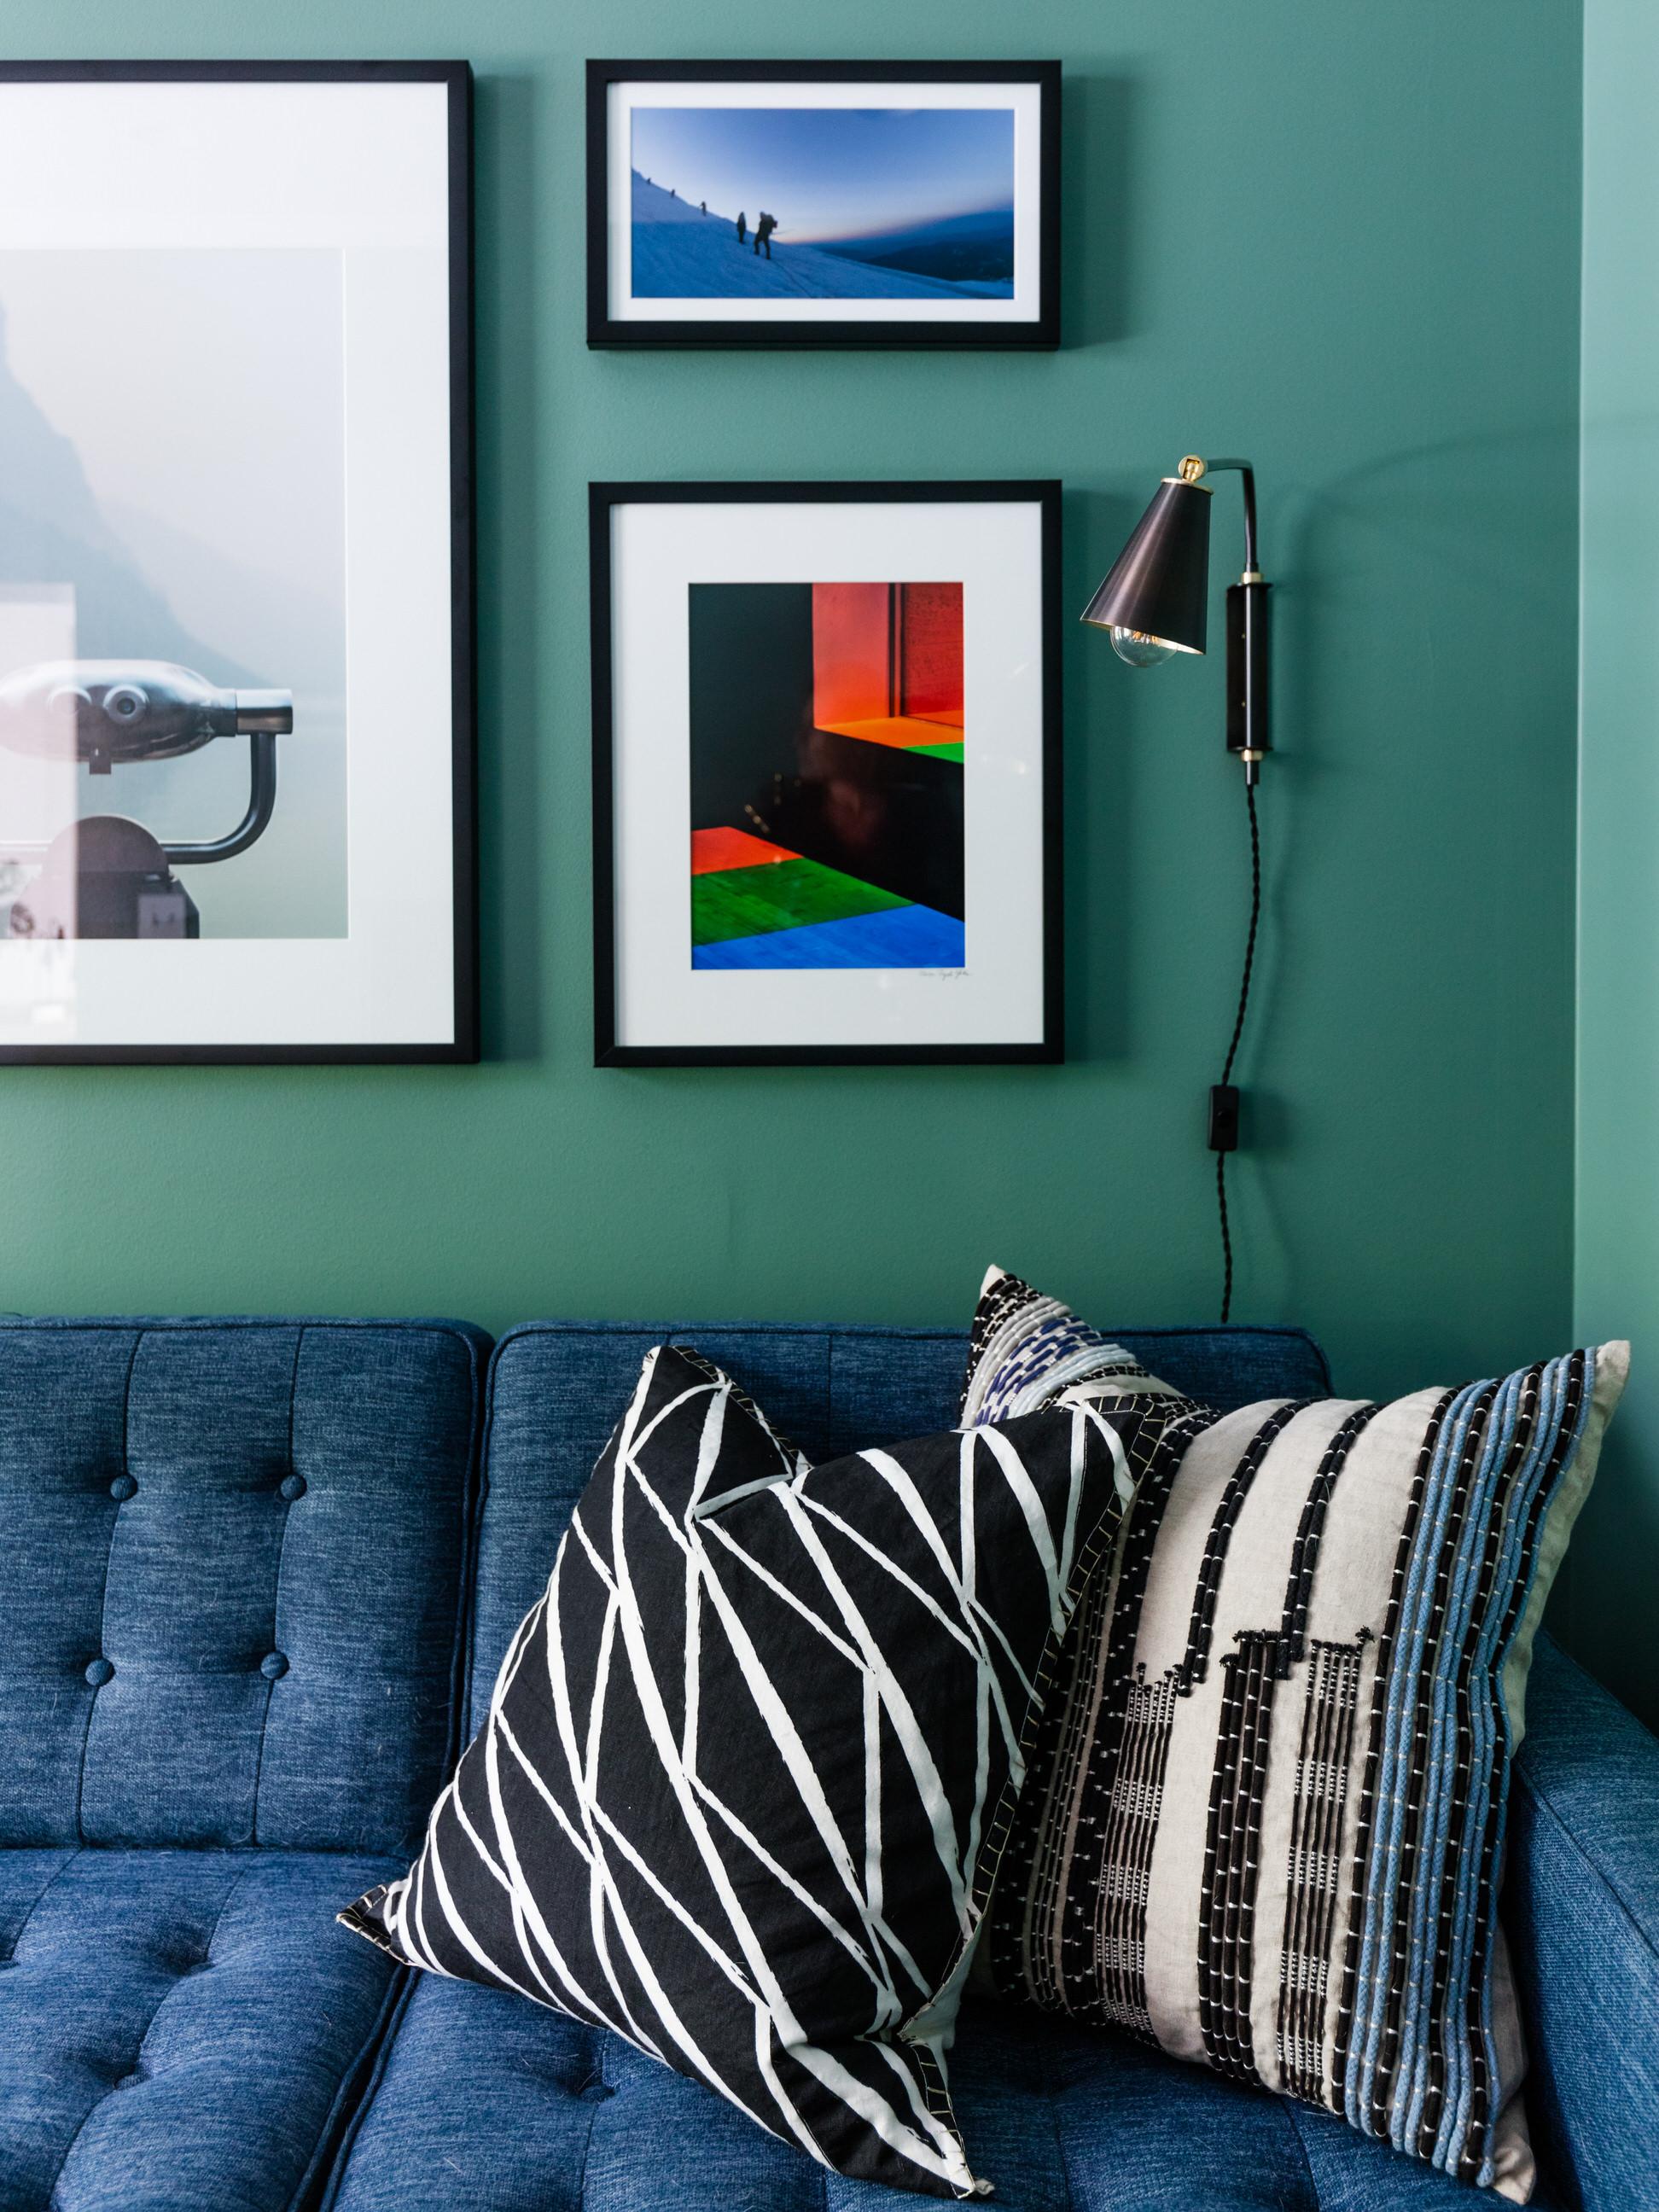 0028-Miranda-Estes-Photography-The-Residency-Bureau-Wallingford-20190515.jpg